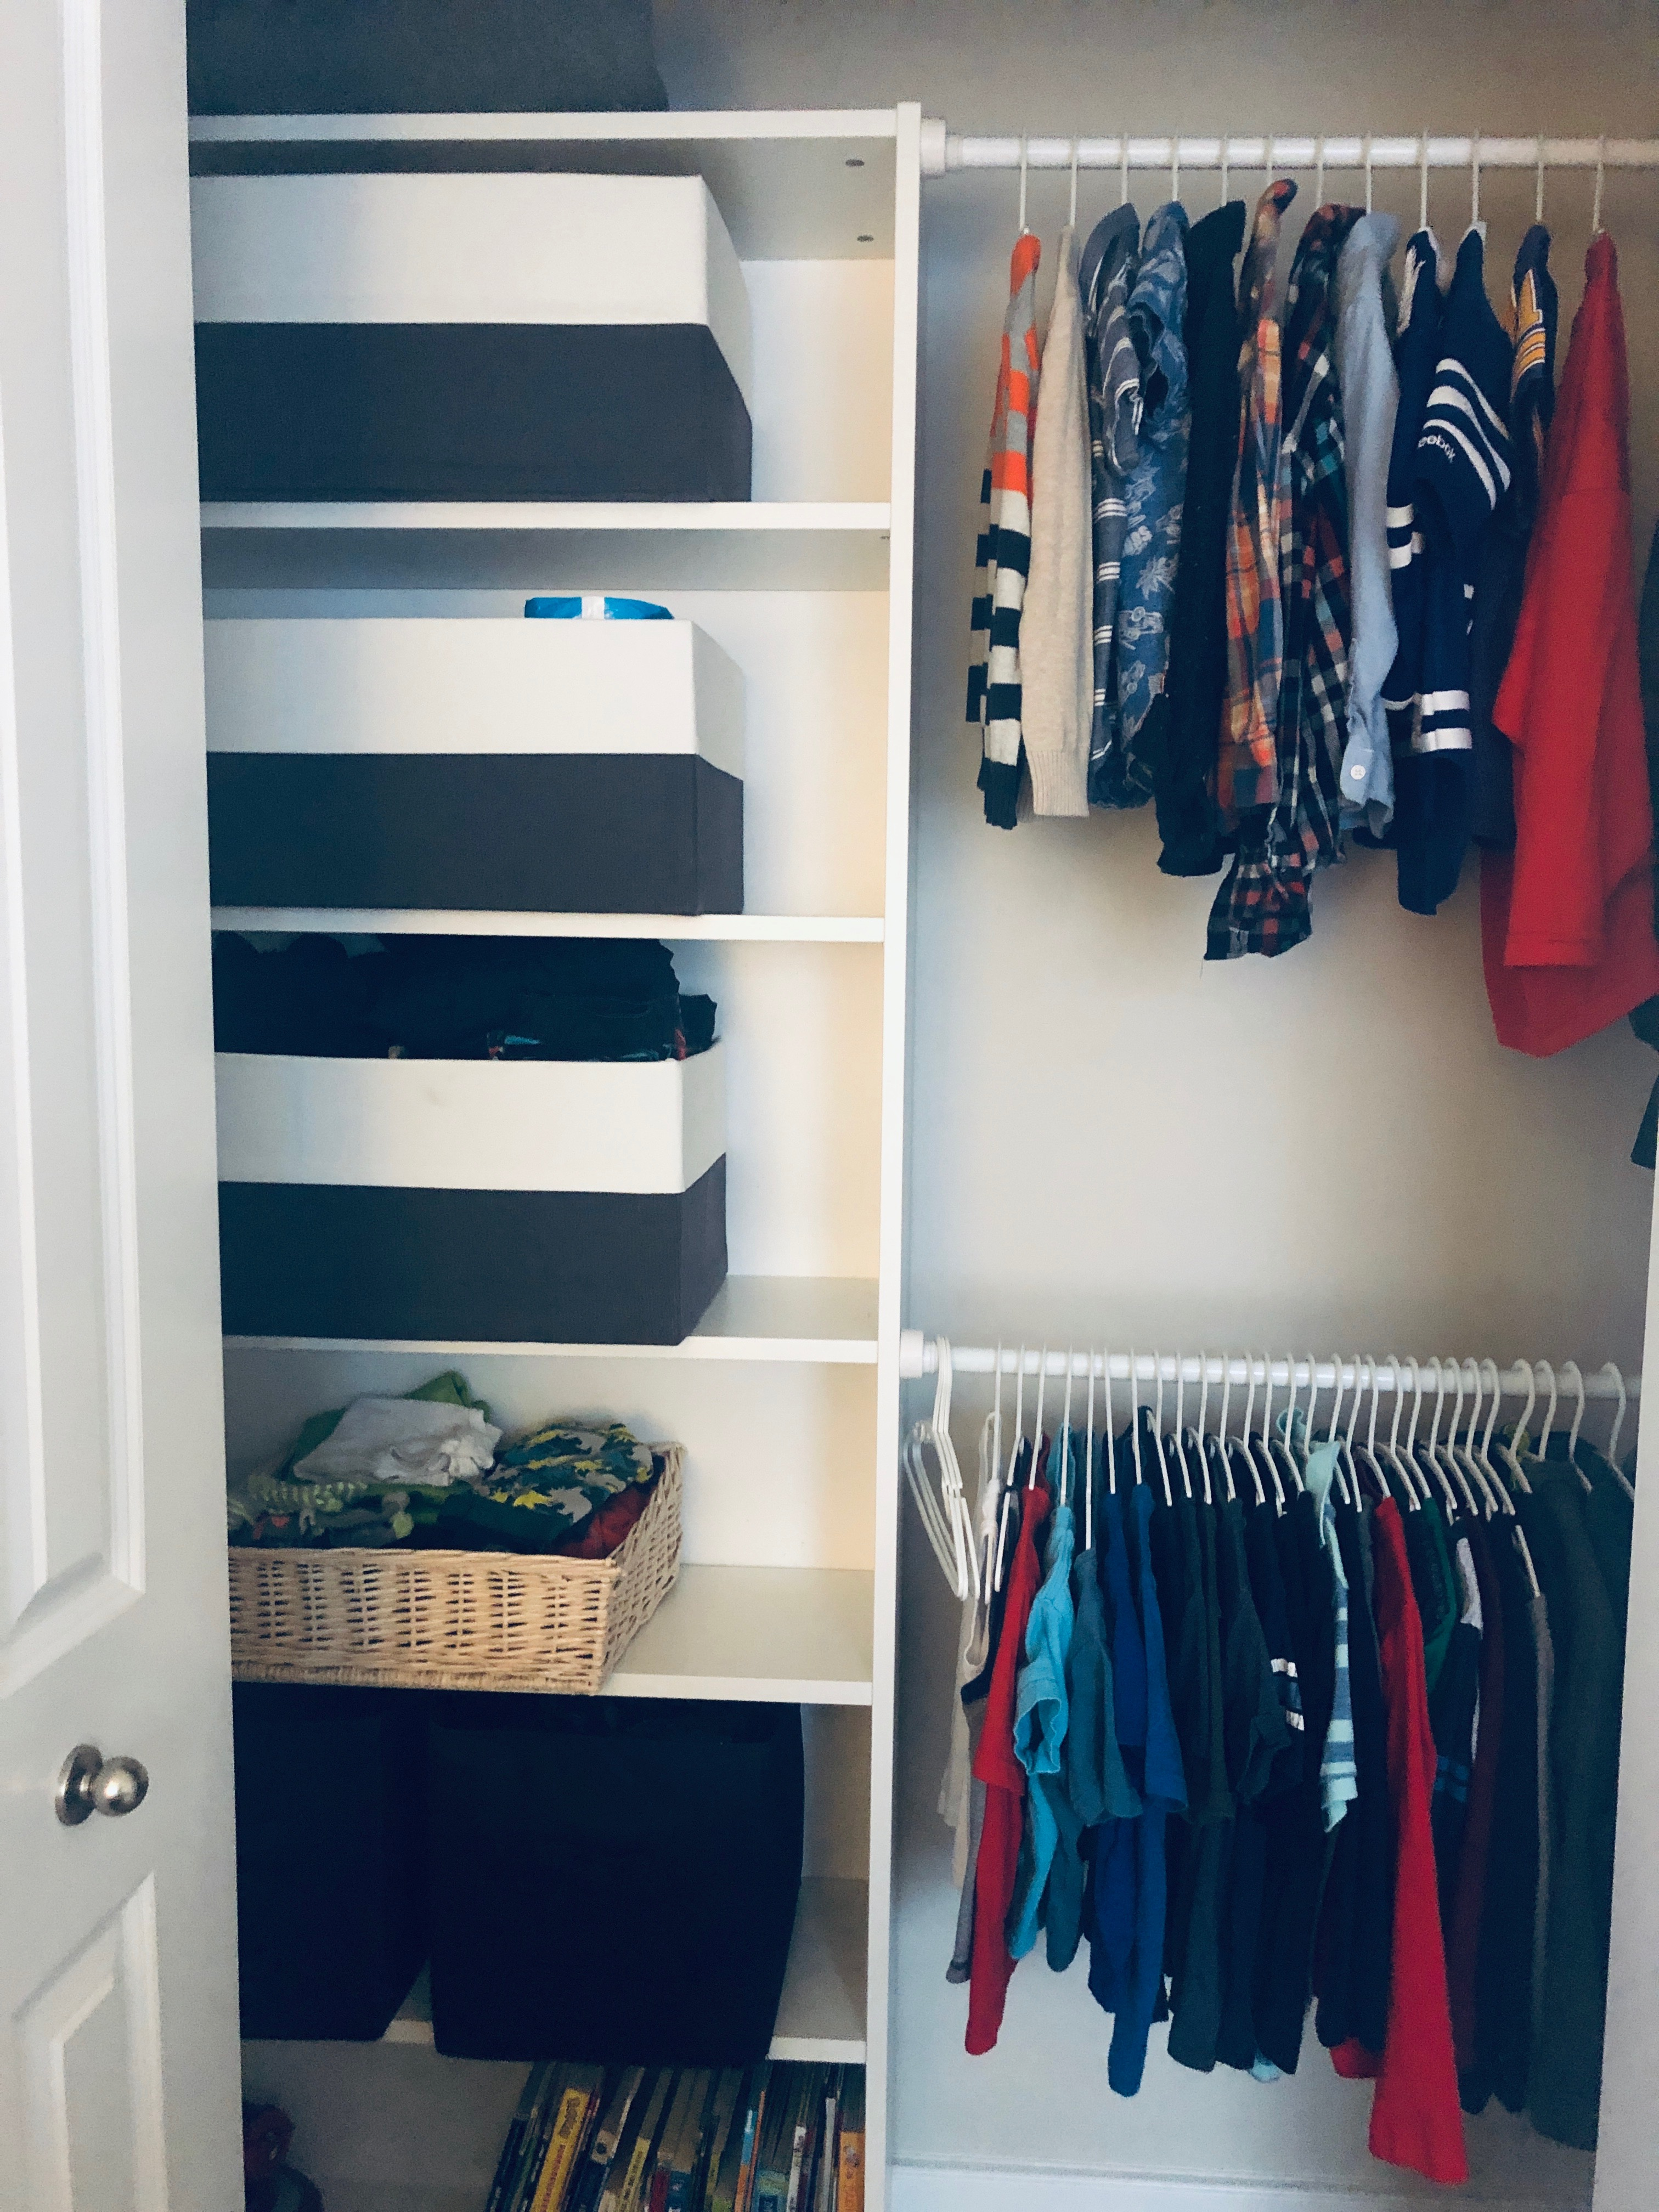 Ethan's Closet